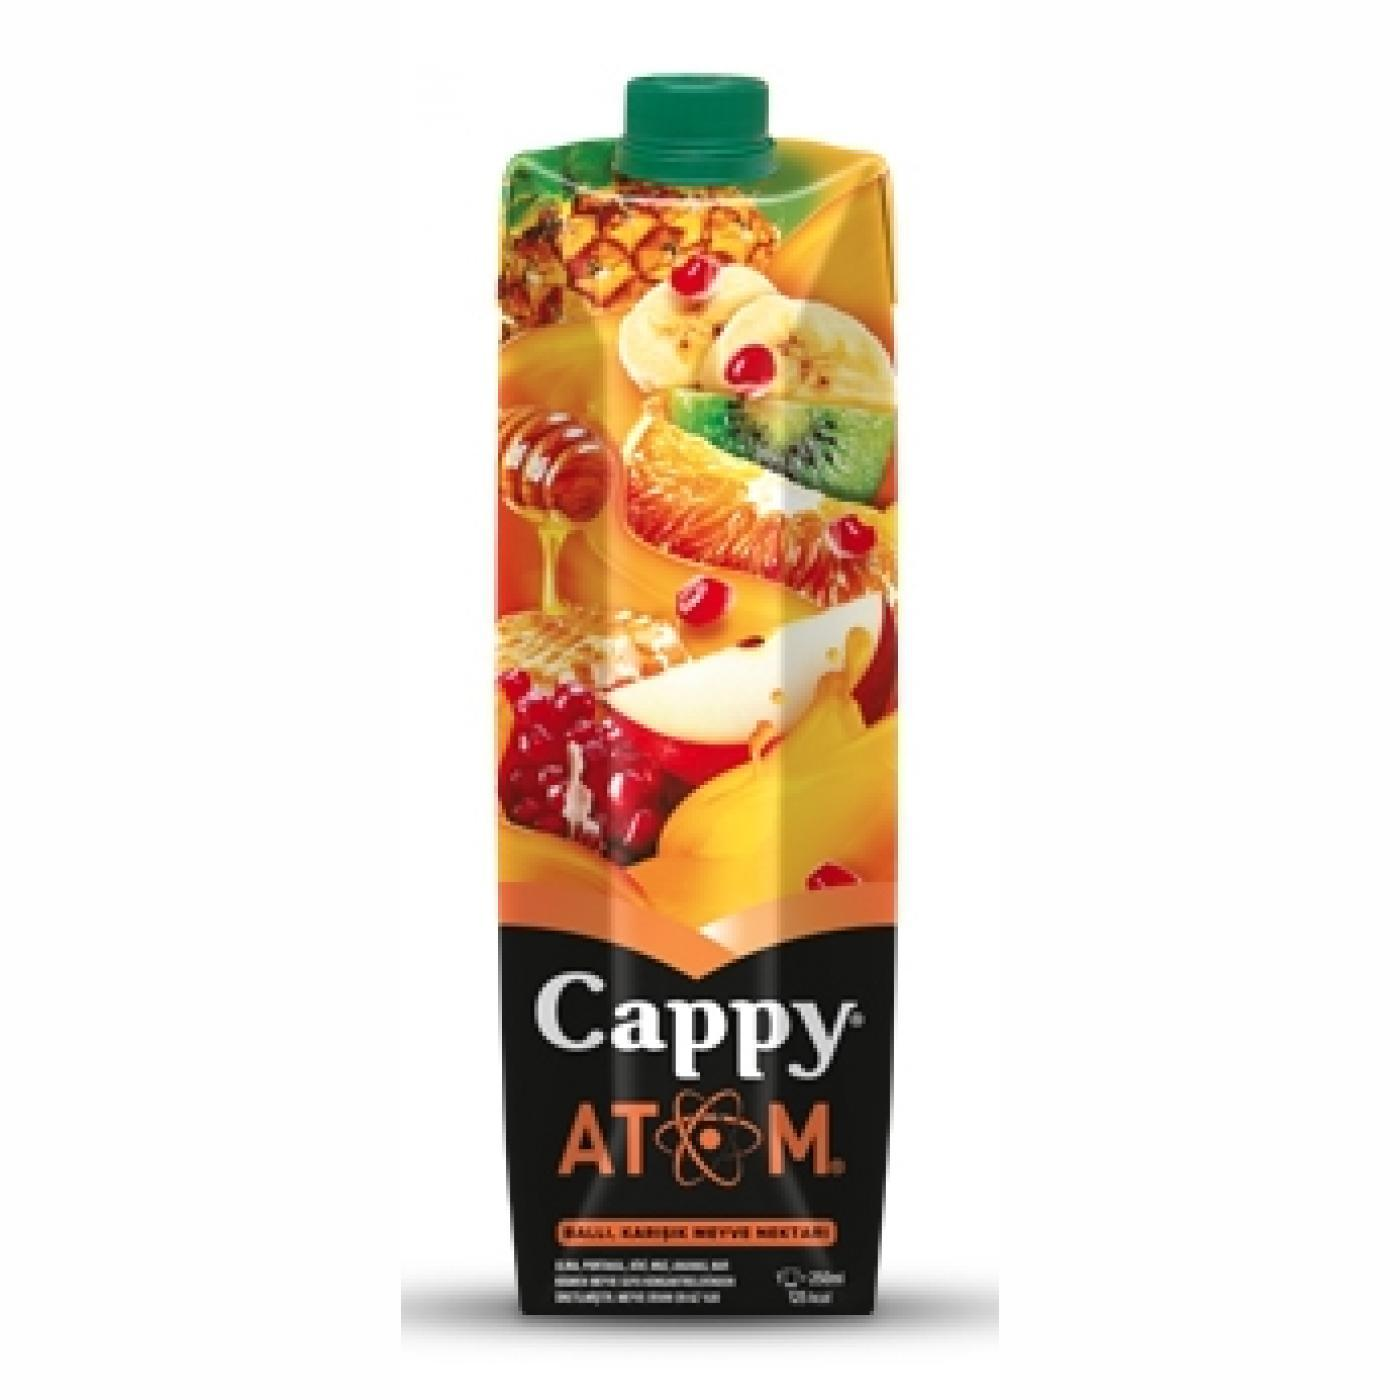 CAPPY 1LT ATOM